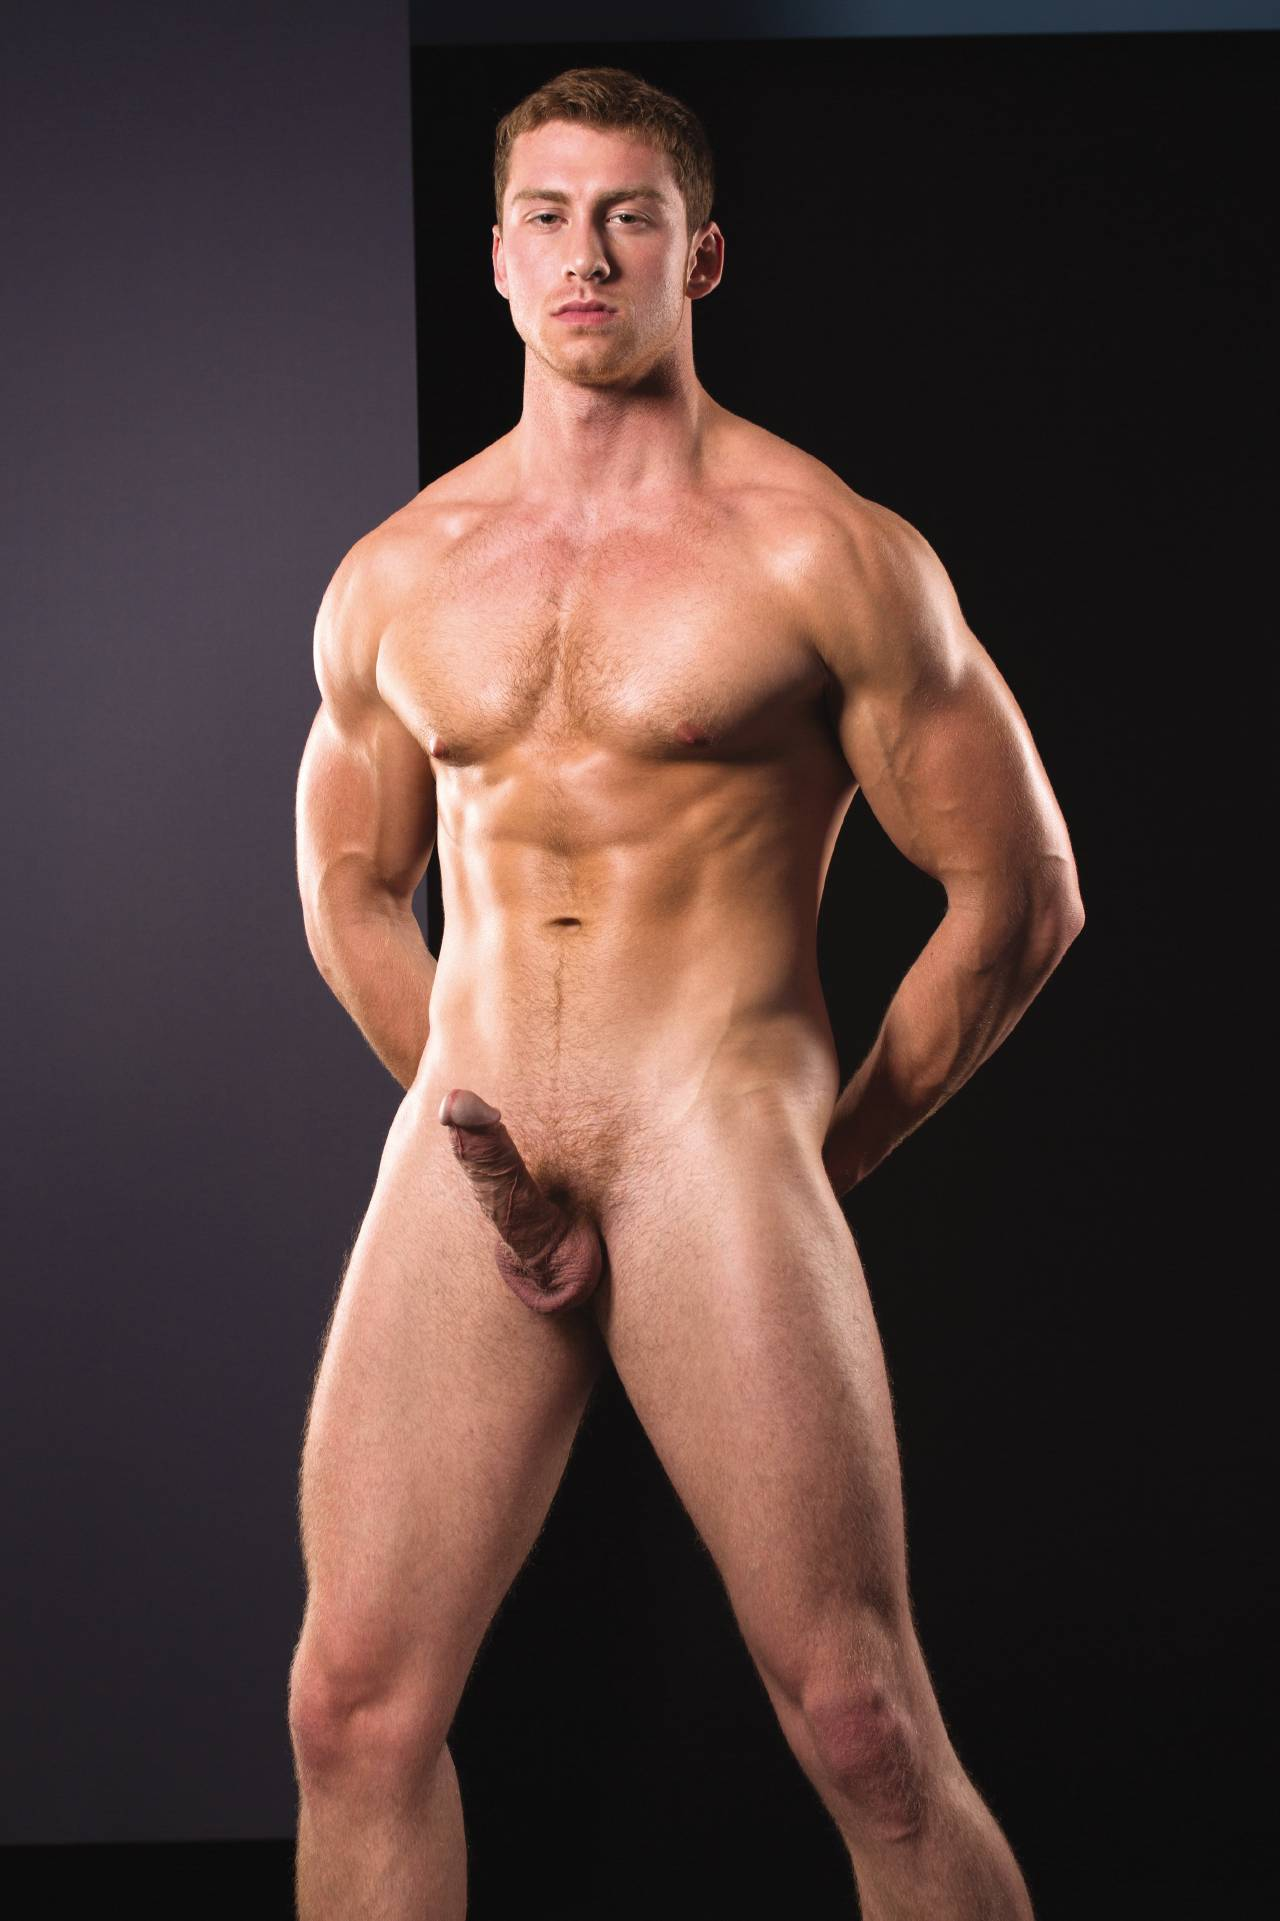 Gay Pornstar Connor Maguire Hq Photo Archive